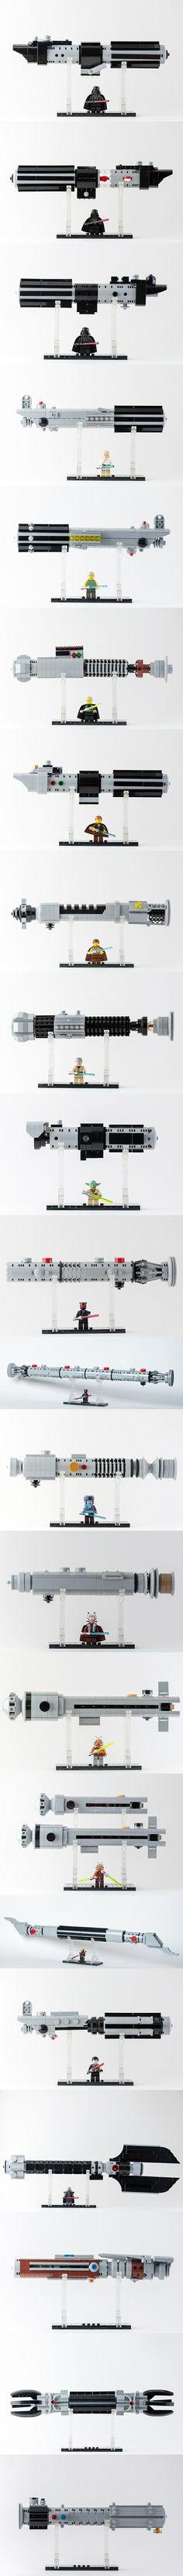 LEGO Star Wars Lightsabers